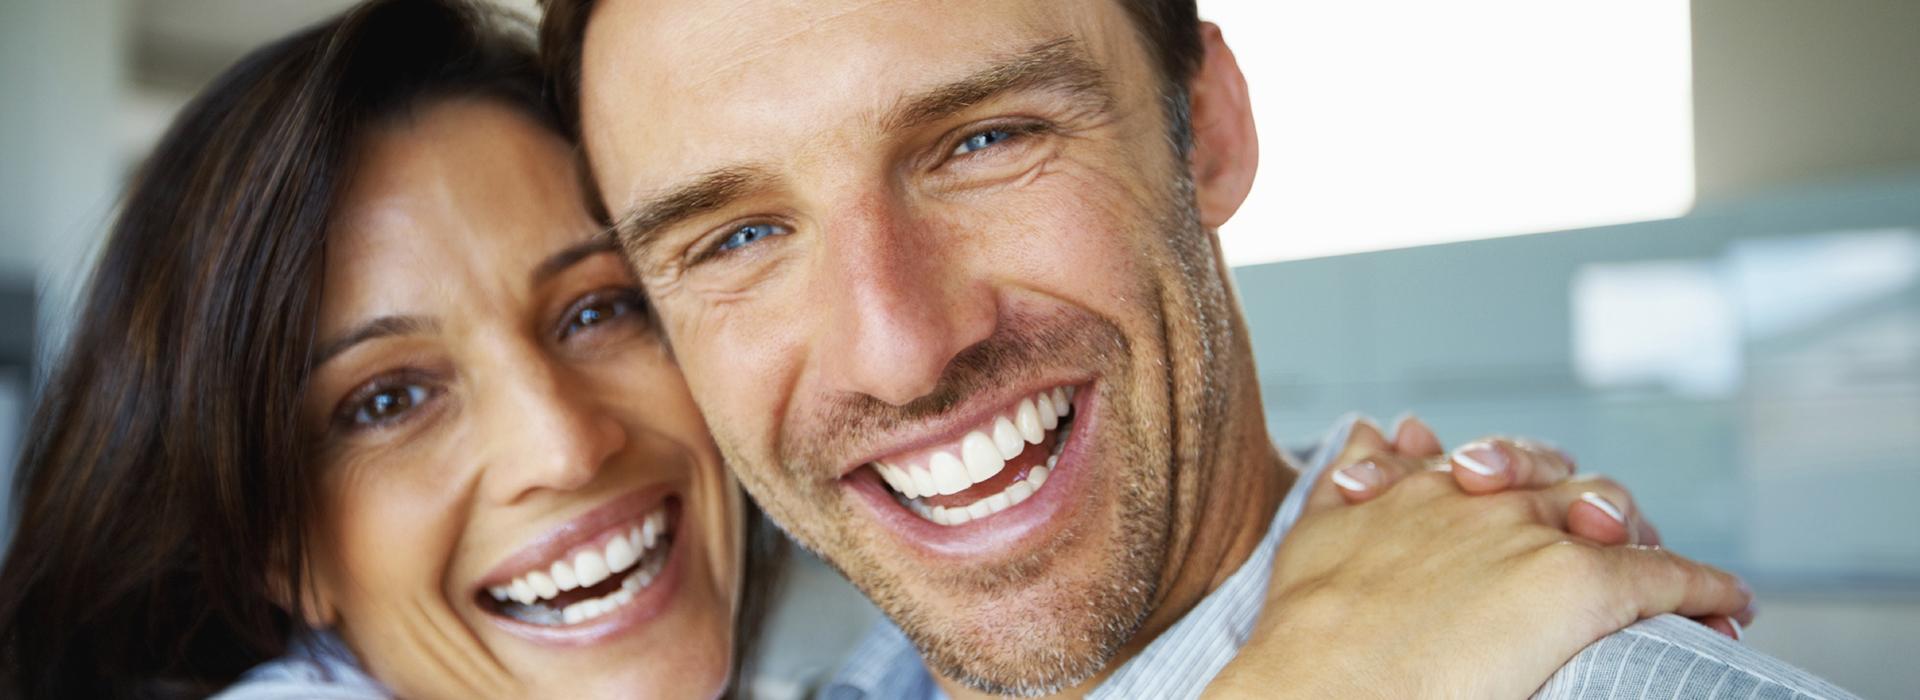 Raise Your Dental IQ And Improve Dental Health